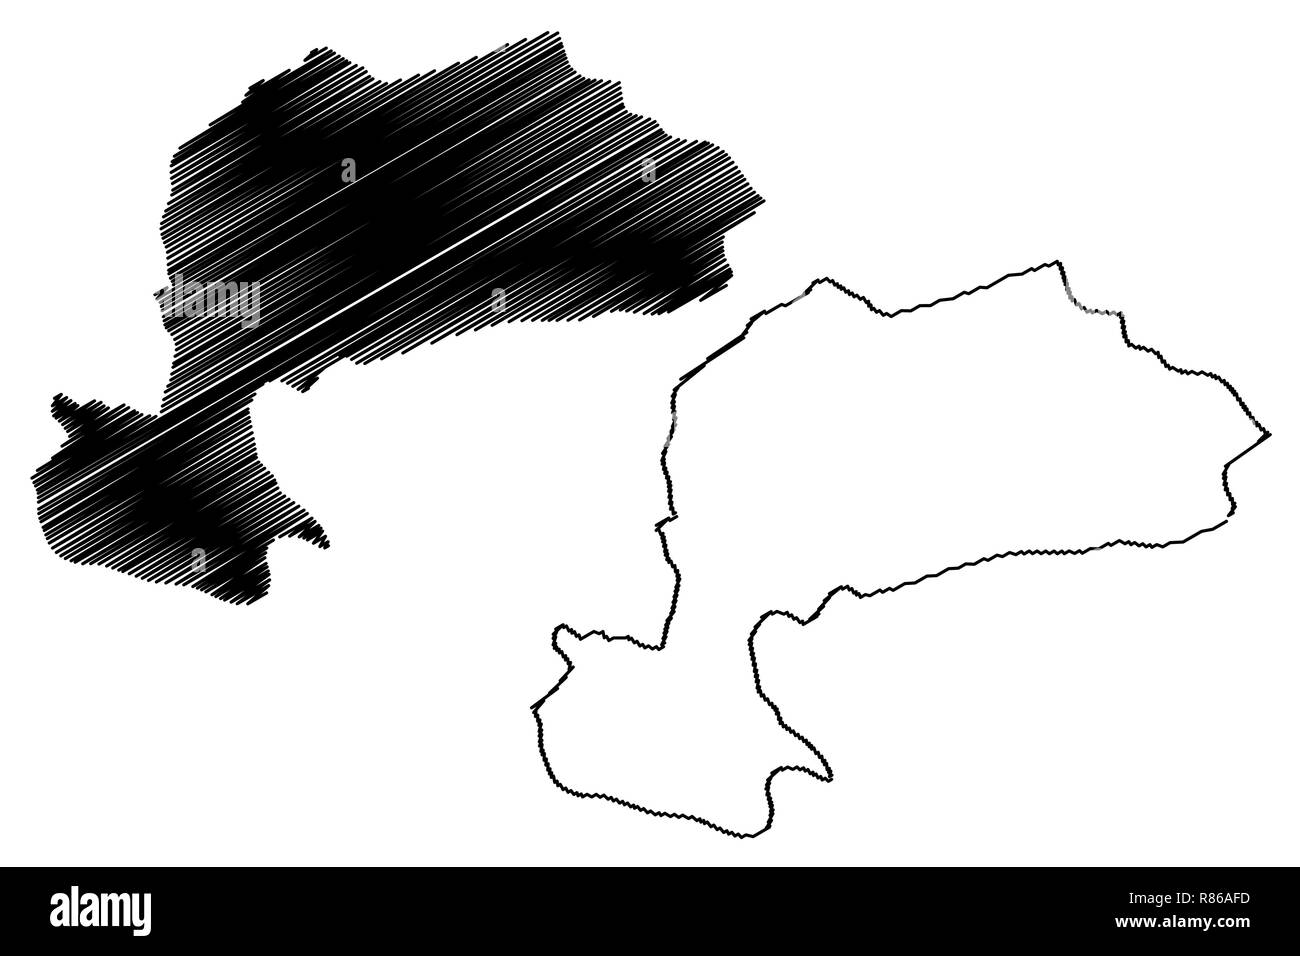 Karaman (Provinces of the Republic of Turkey) map vector illustration, scribble sketch Karaman ili map - Stock Image